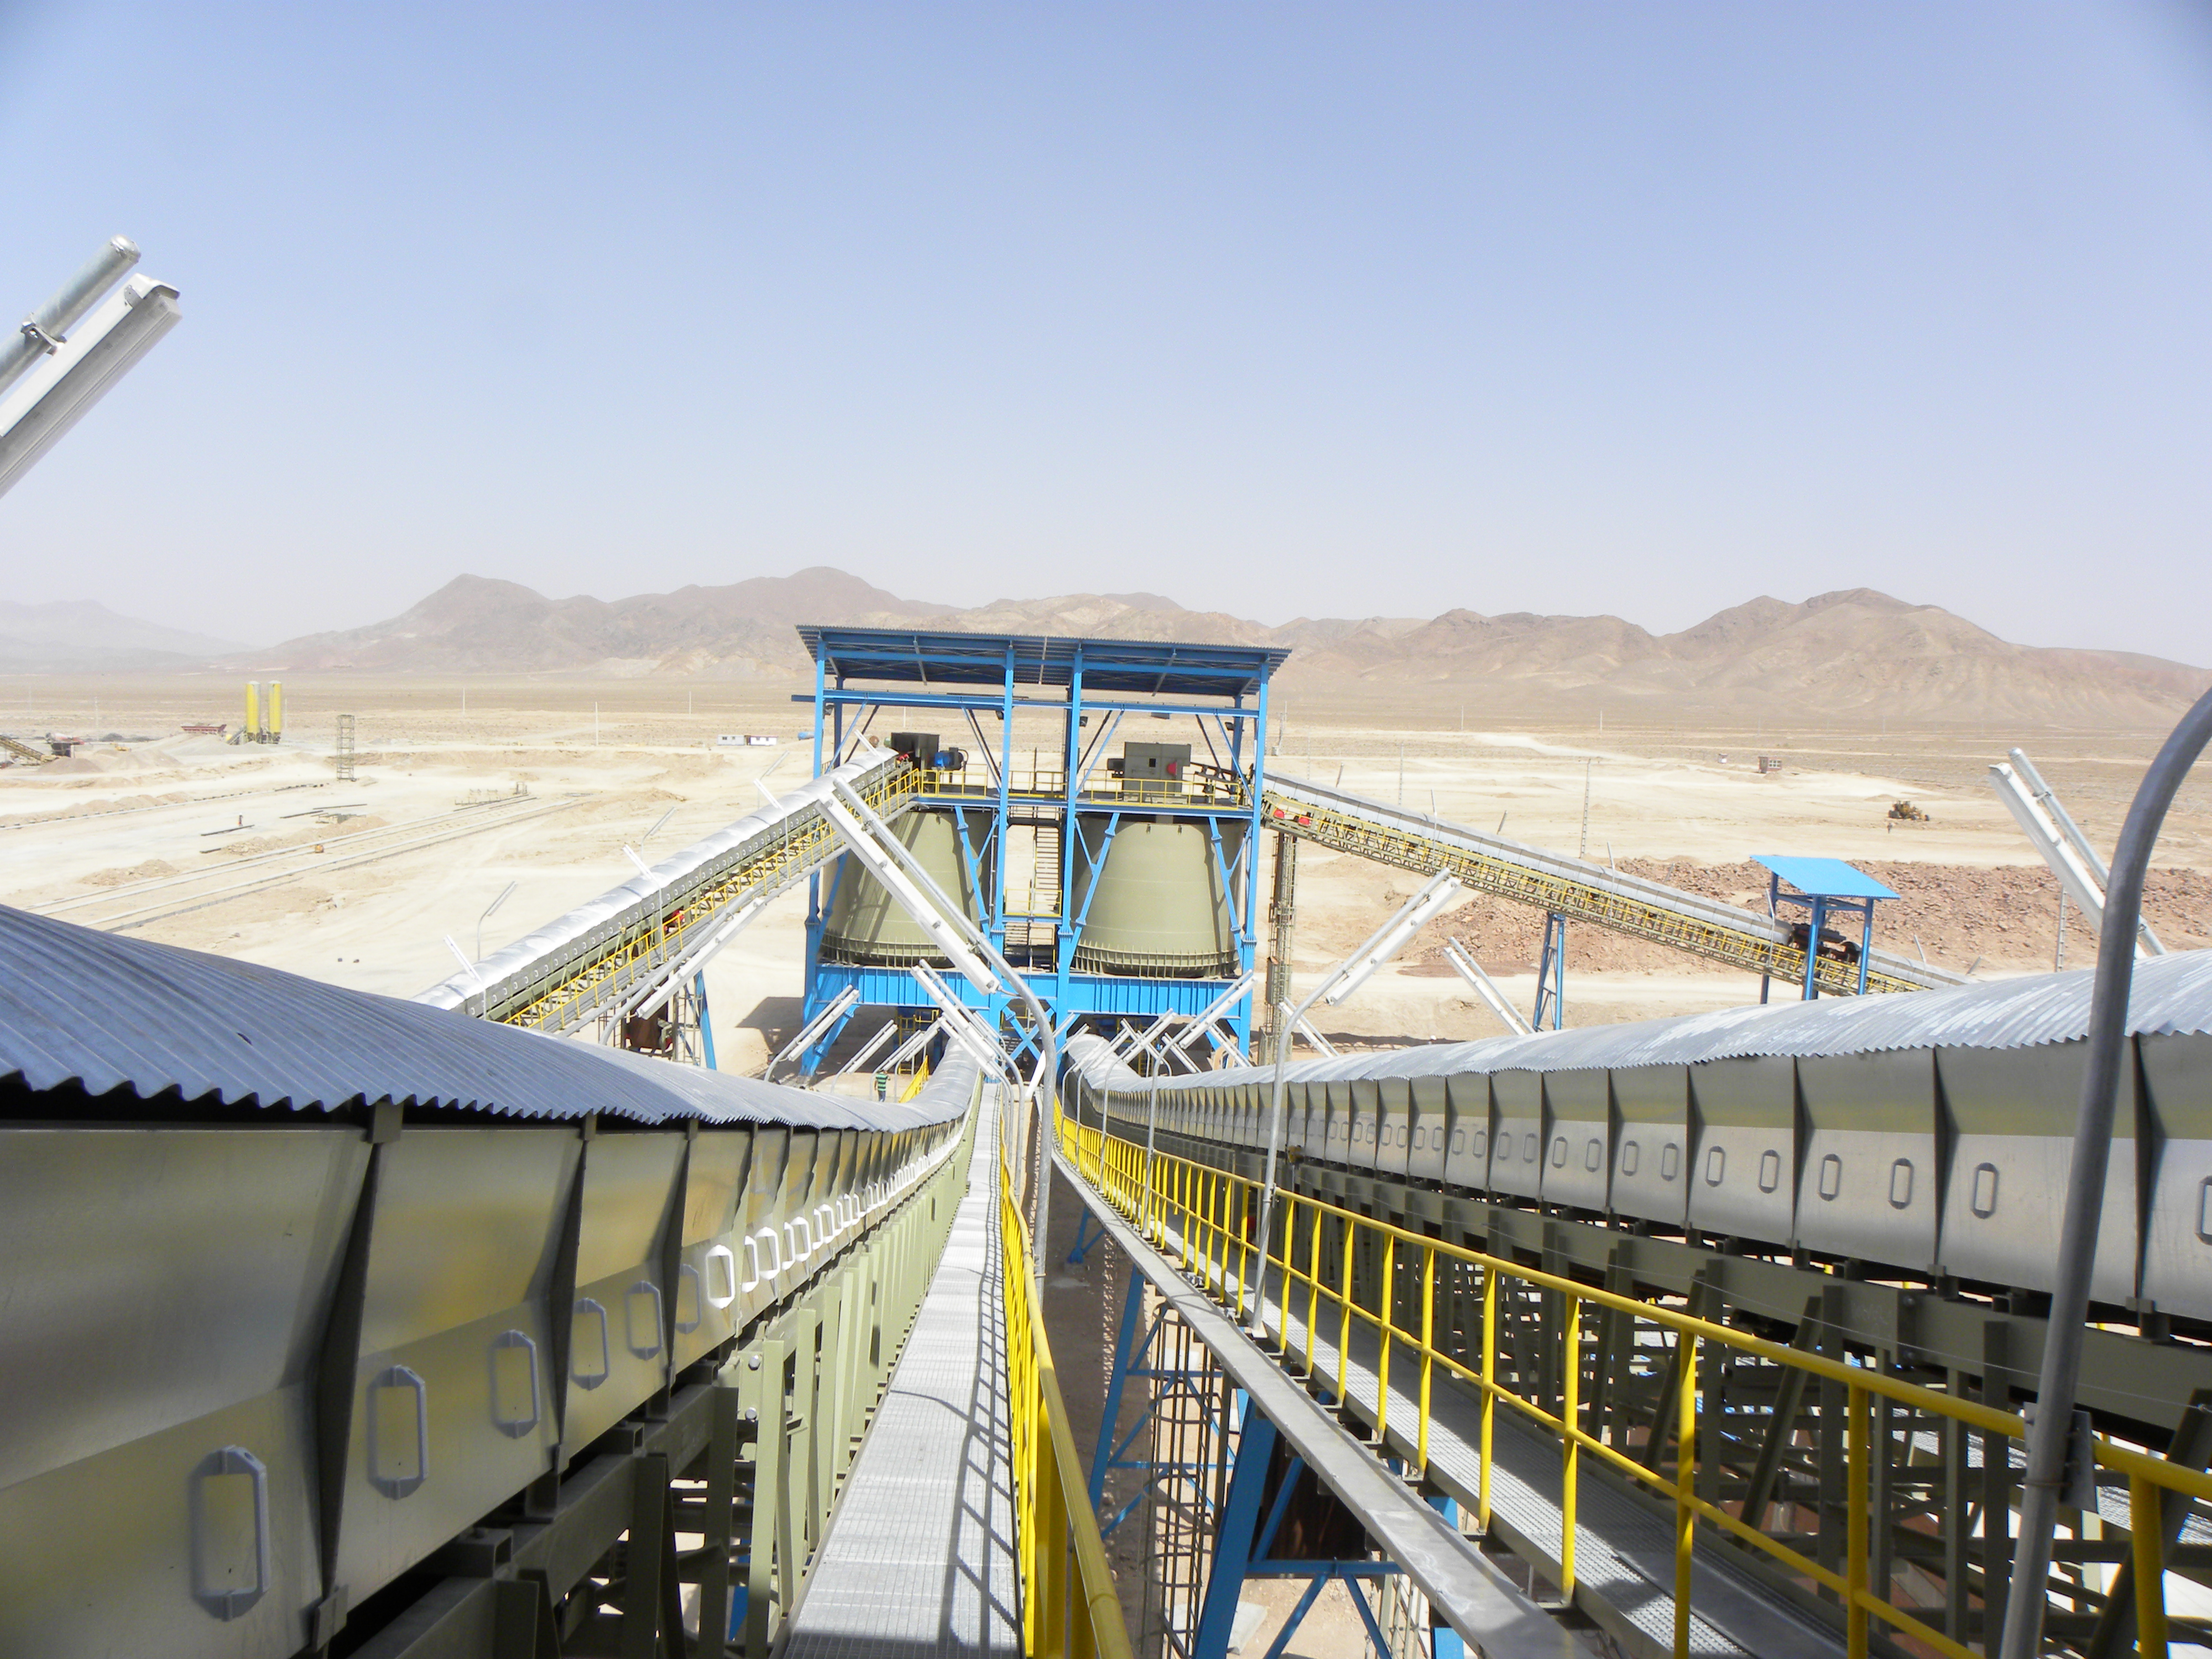 كارخانه توليد كنسانتره سنگ آهن زرند و سيرجان